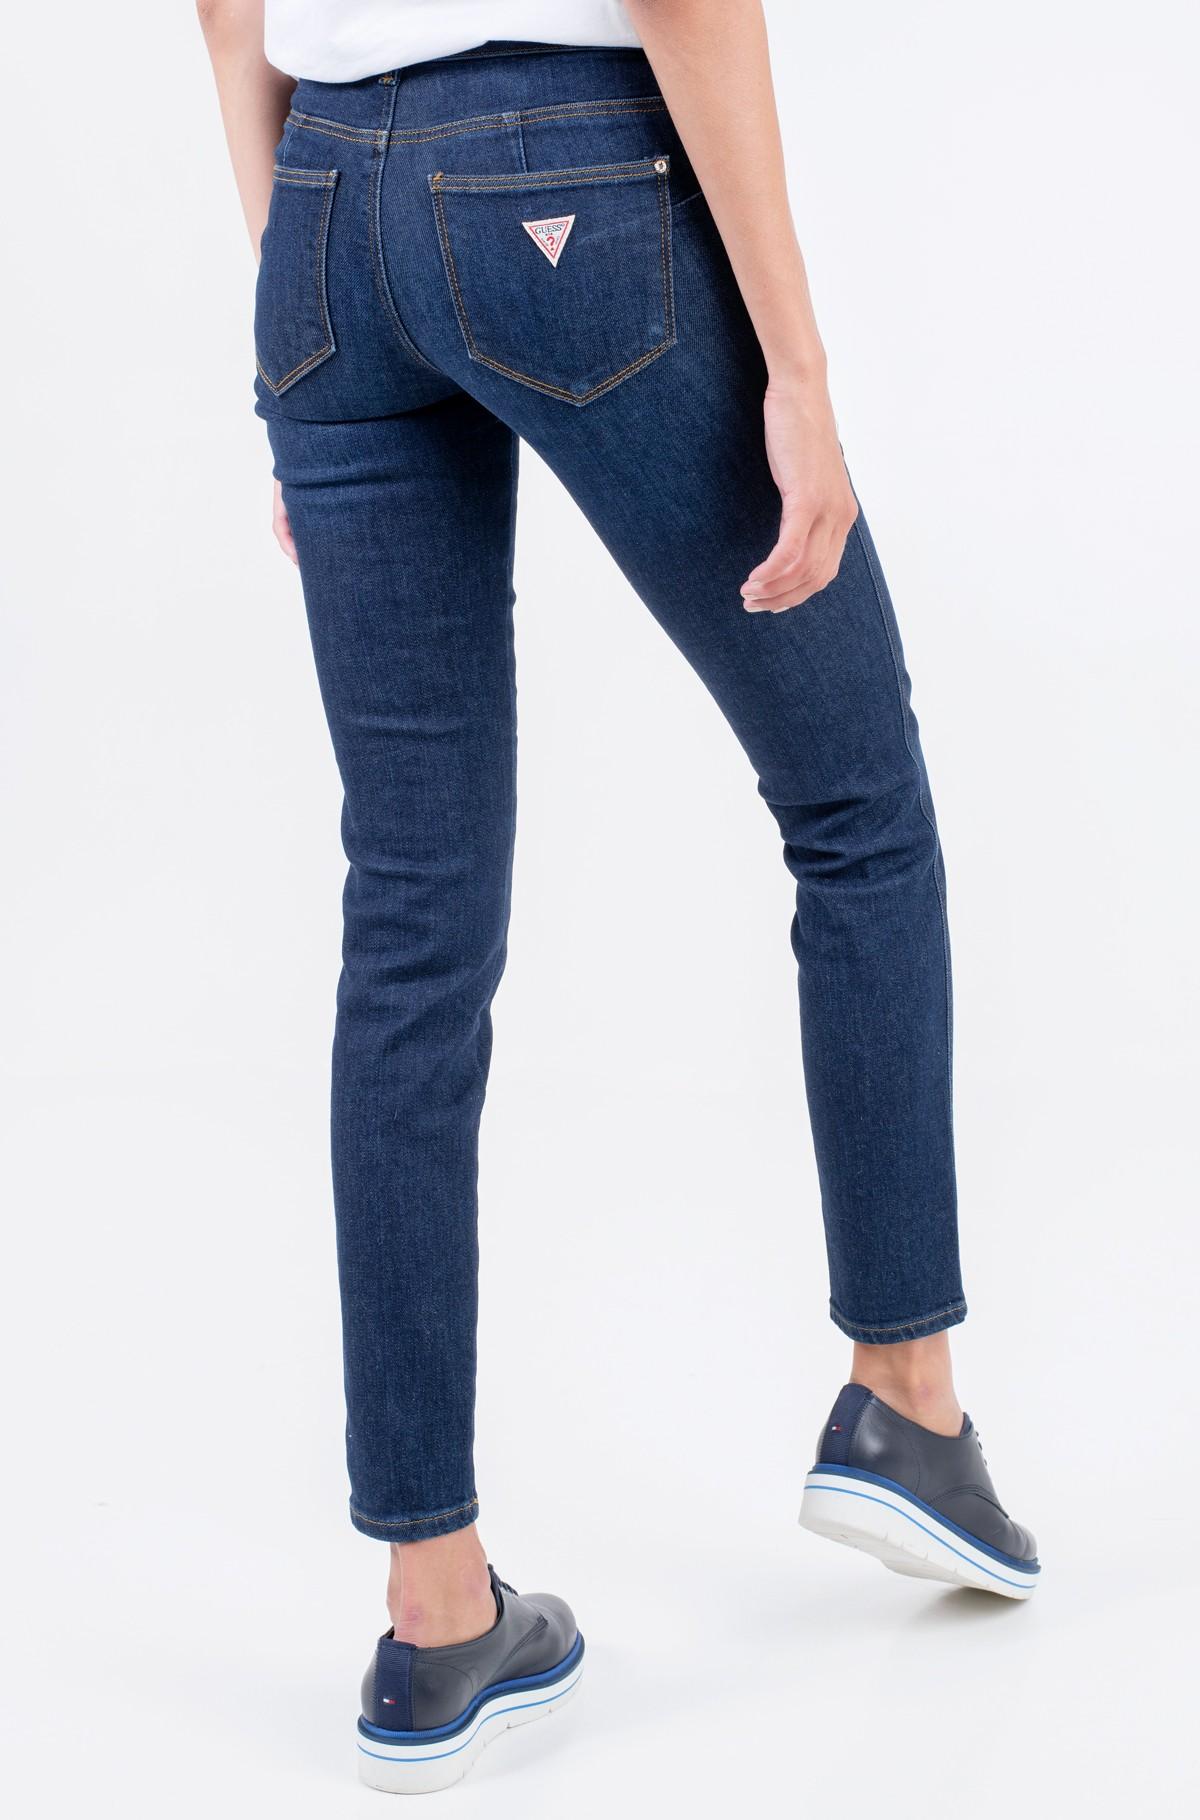 Jeans W1YAJ2 D4GV1-full-2